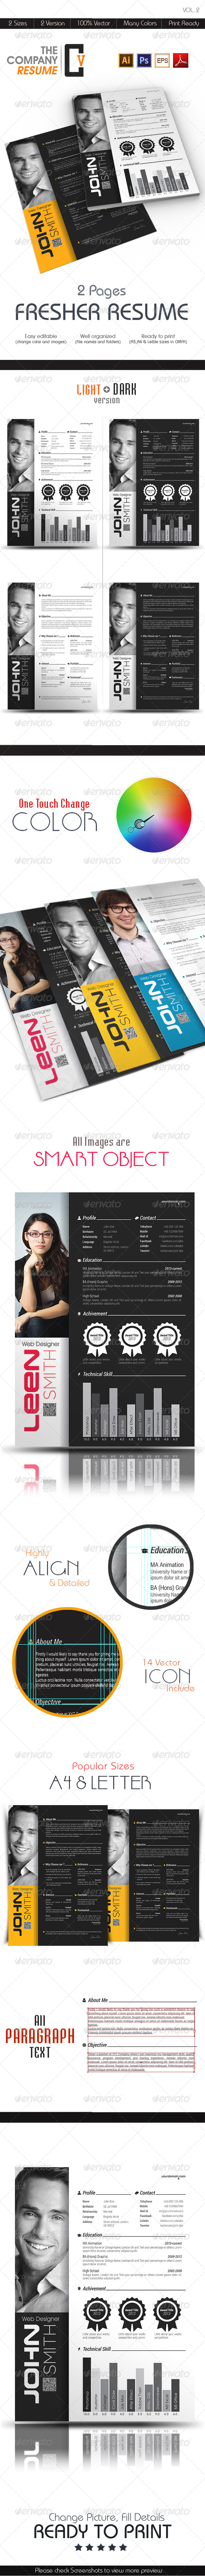 The Company Fresher Resume - Resumes Stationery